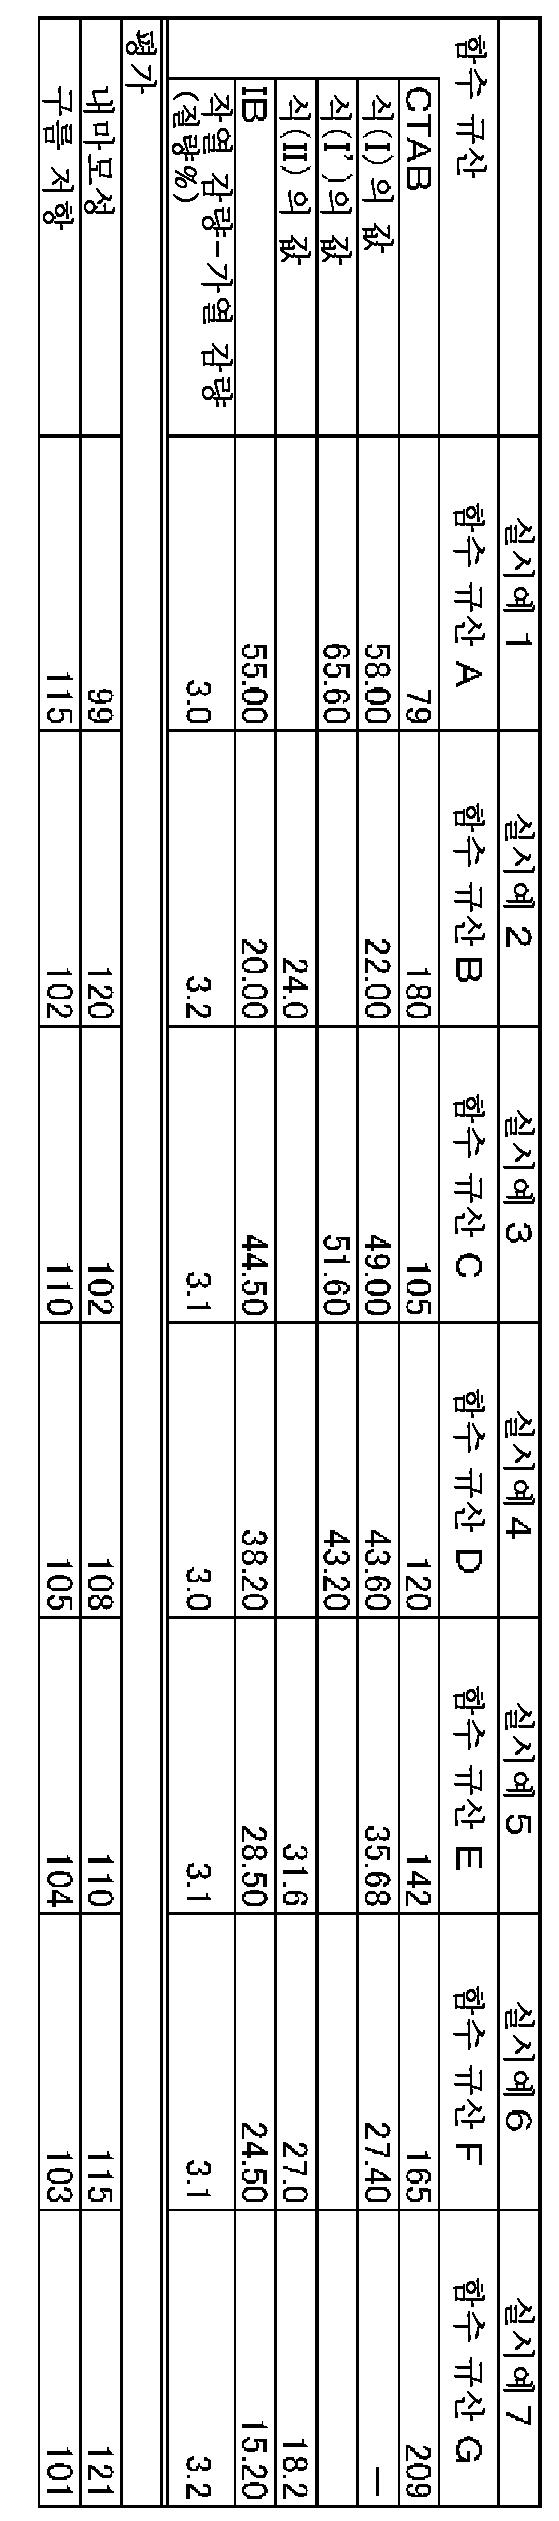 Figure 112013012094543-pct00011